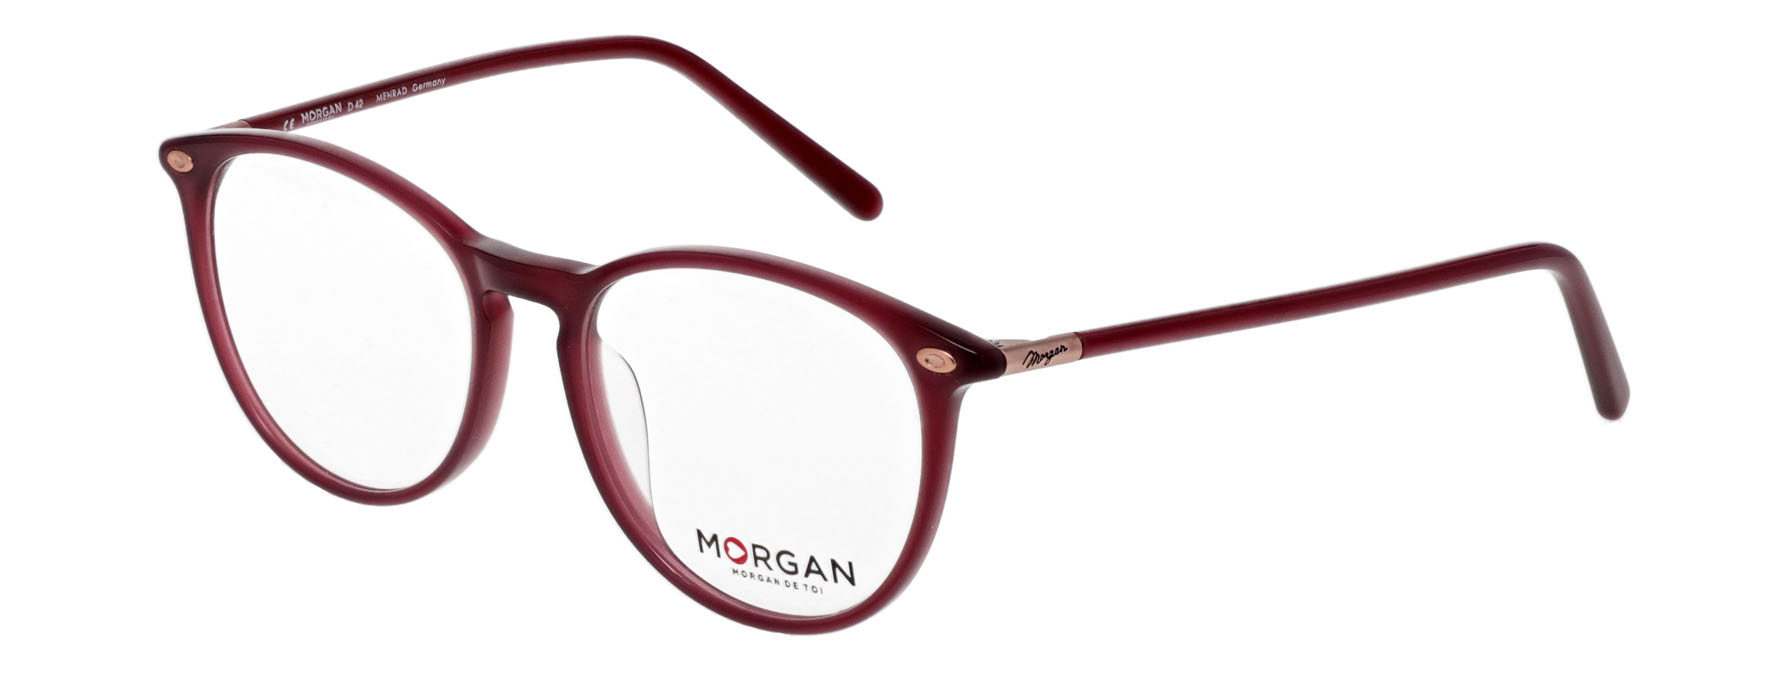 Morgan 202022 4589